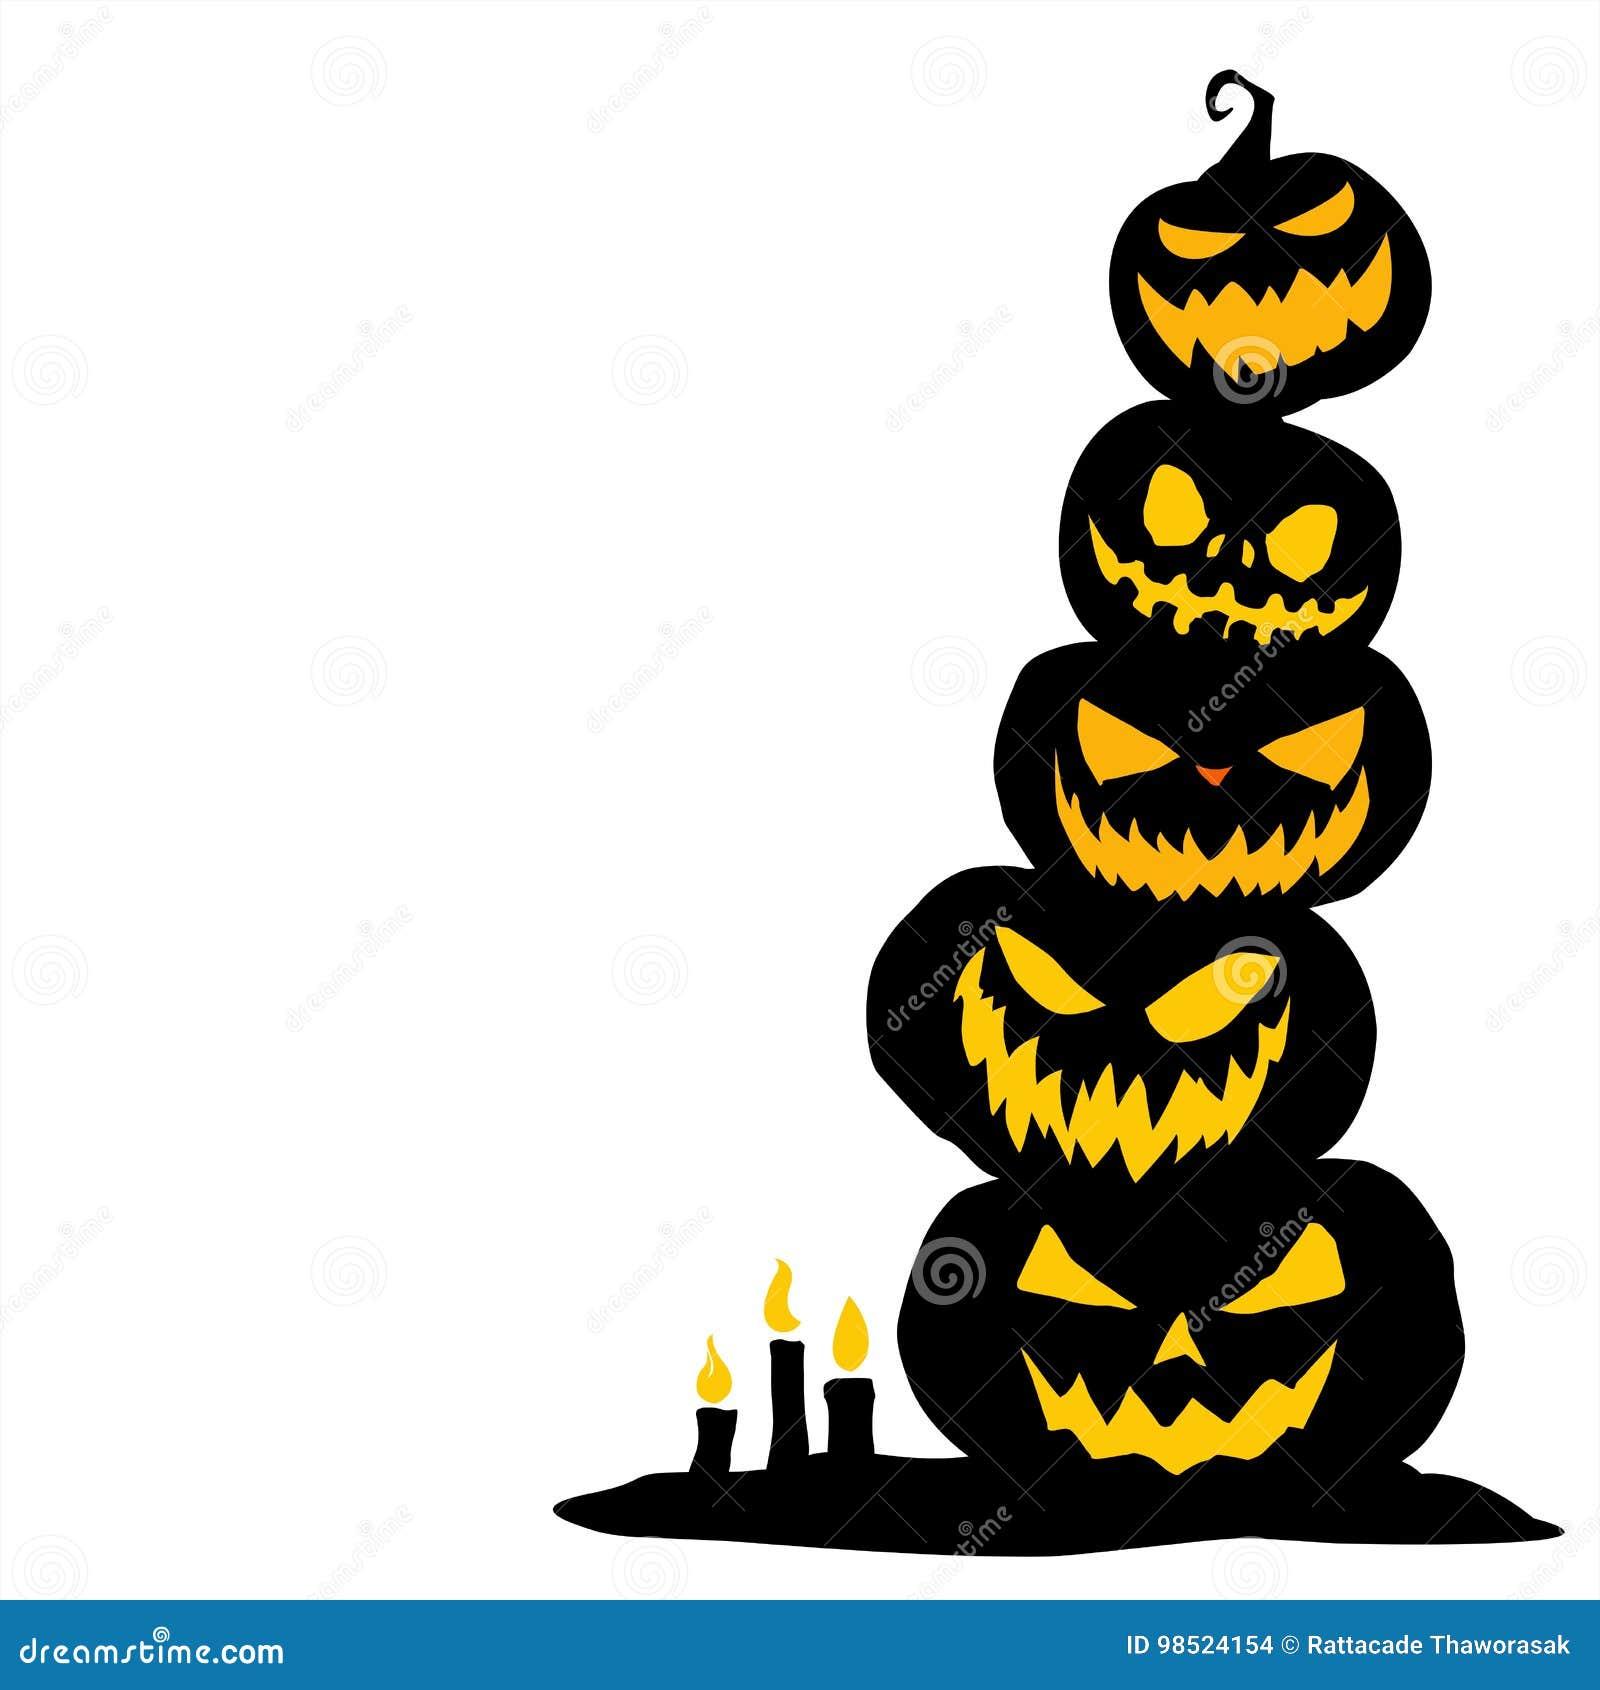 Halloween graphic resource background